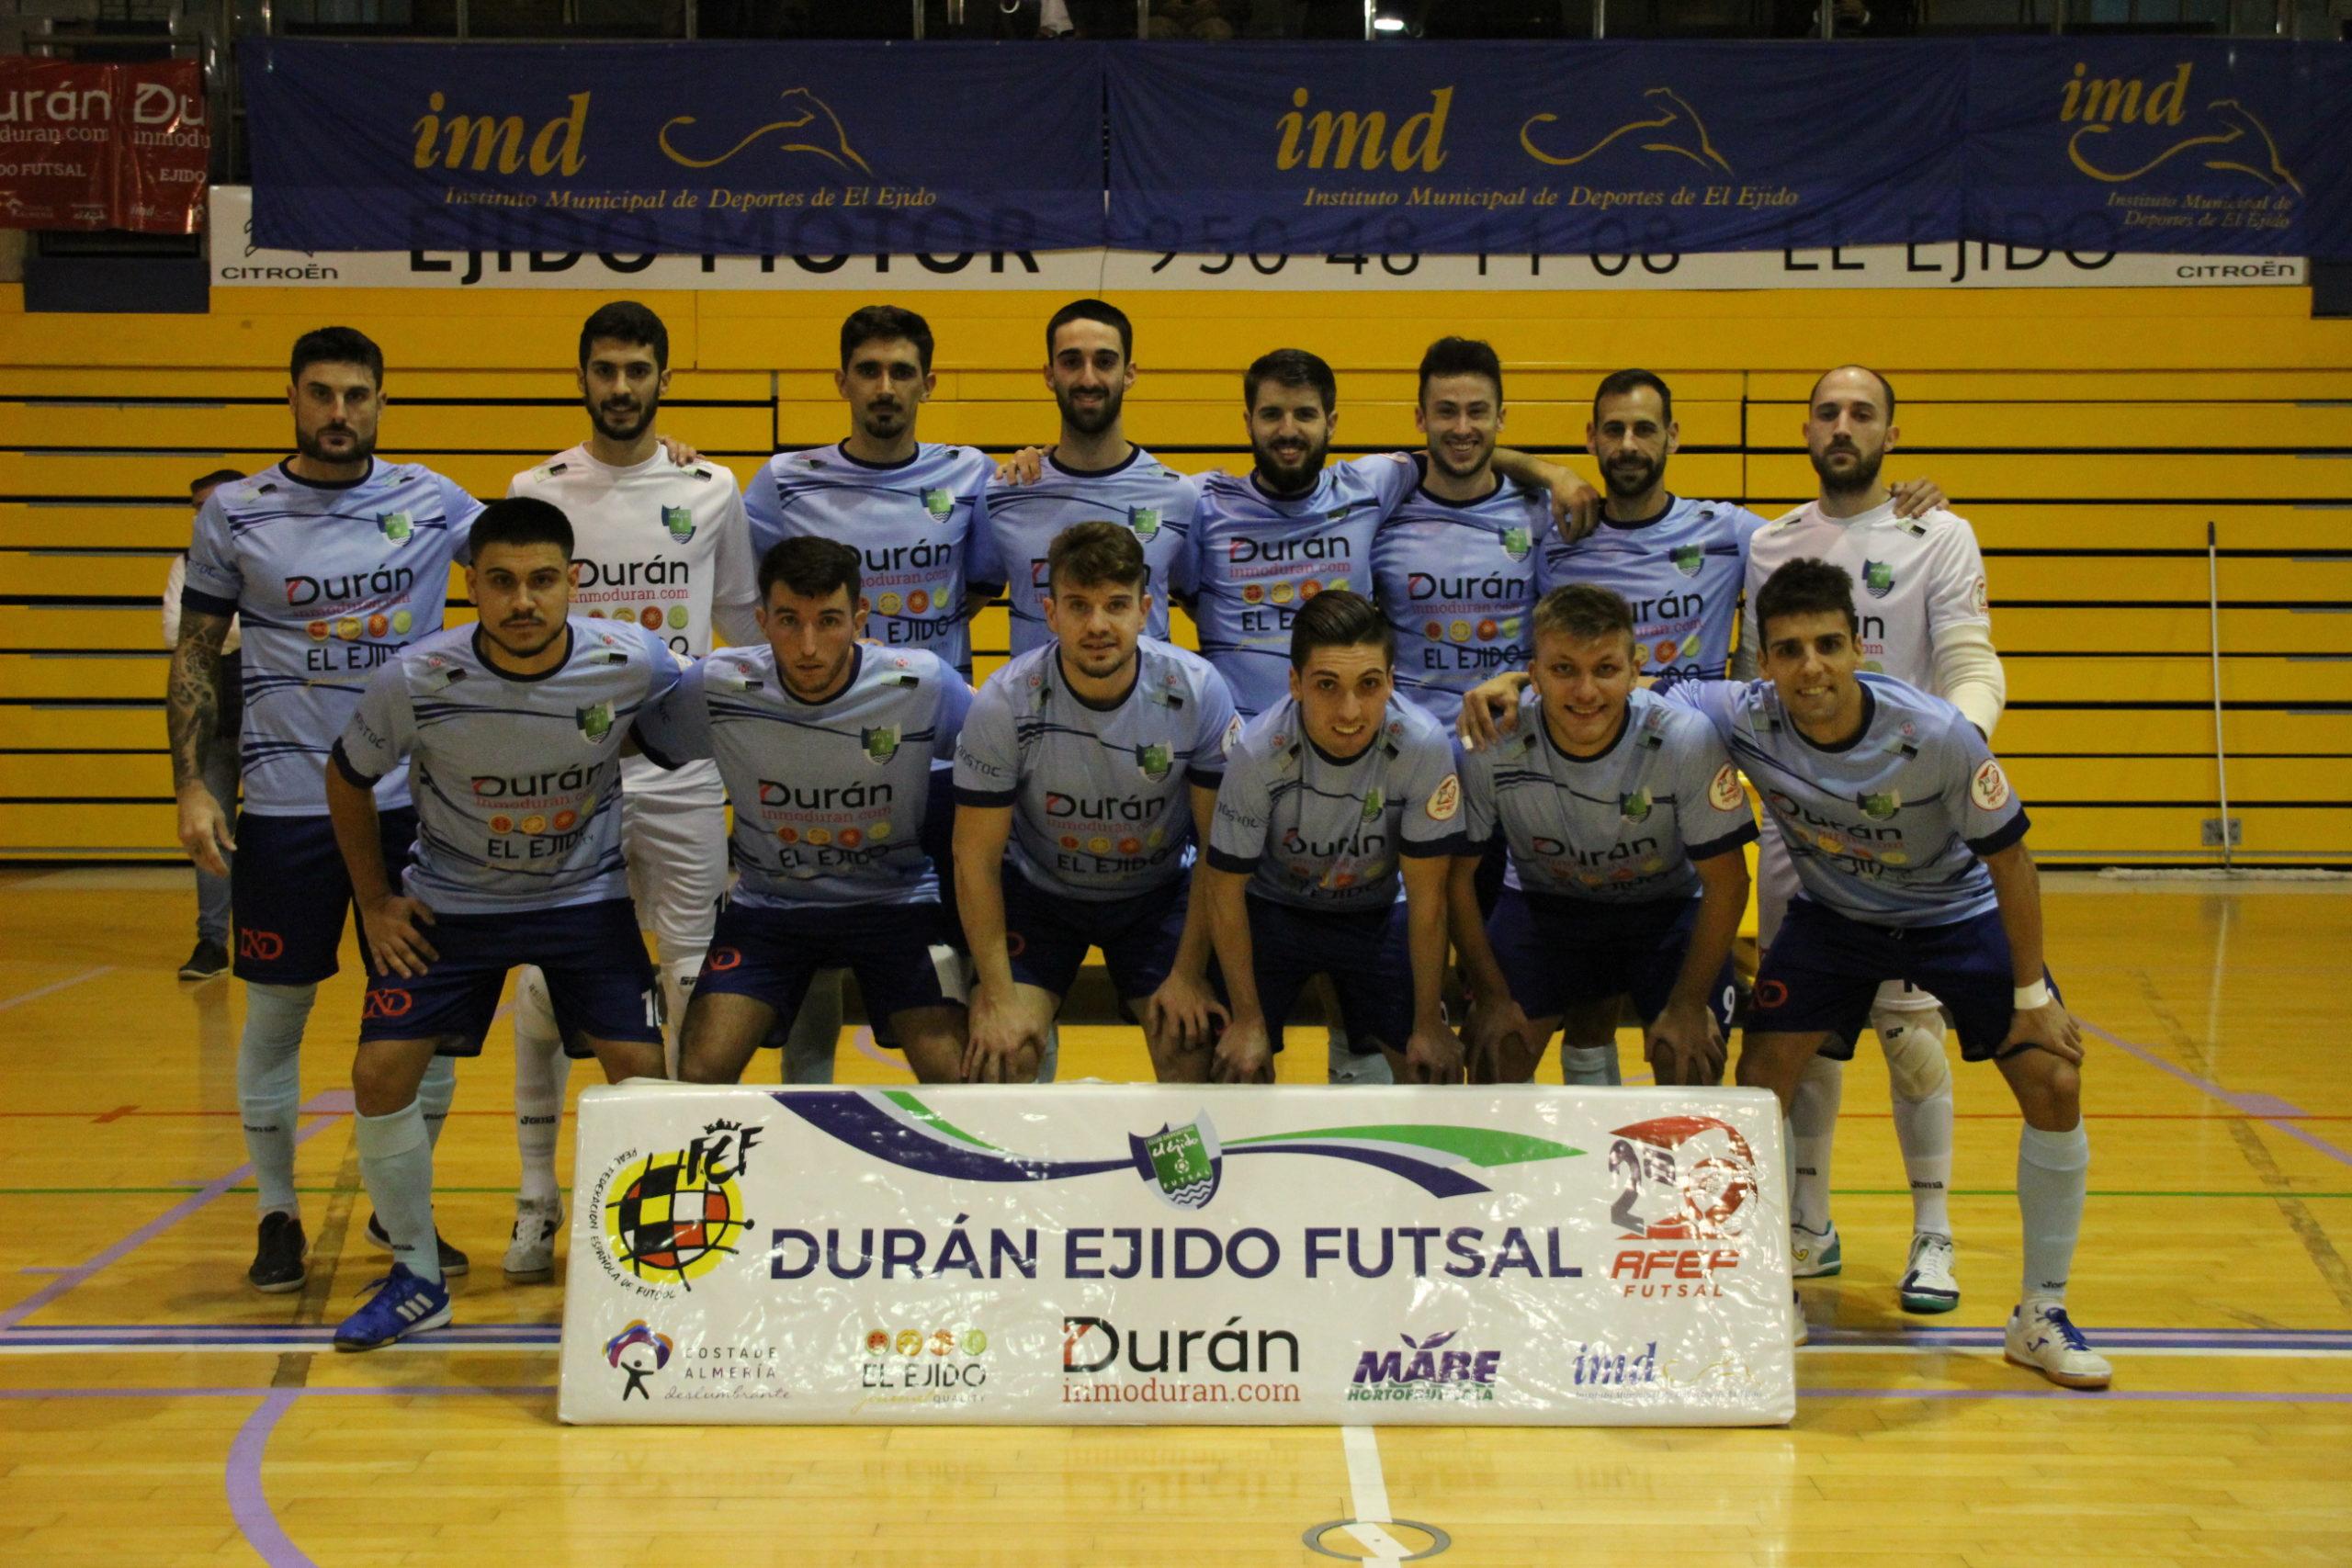 Durán Ejido Futsal cae 2-3 frente a Jimbee Cartagena